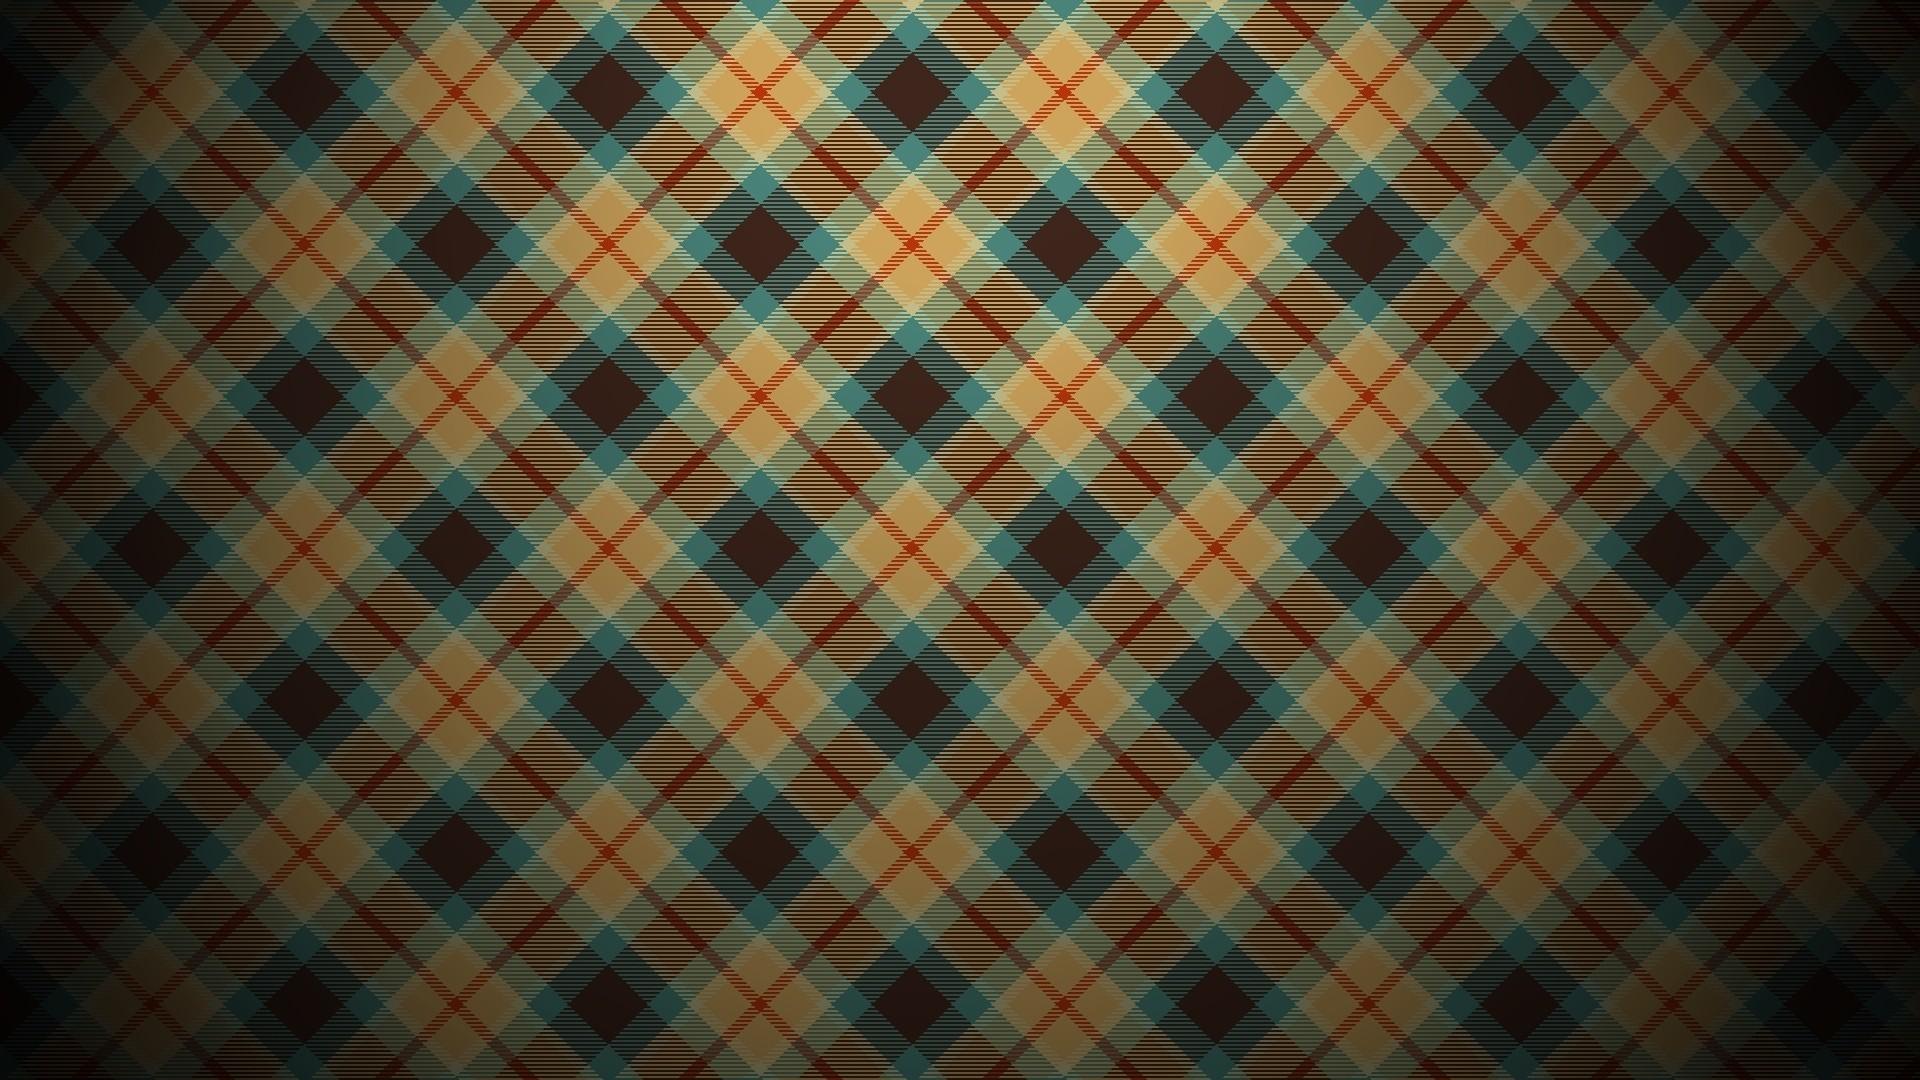 Wallpaper Texture, Cell, Retro